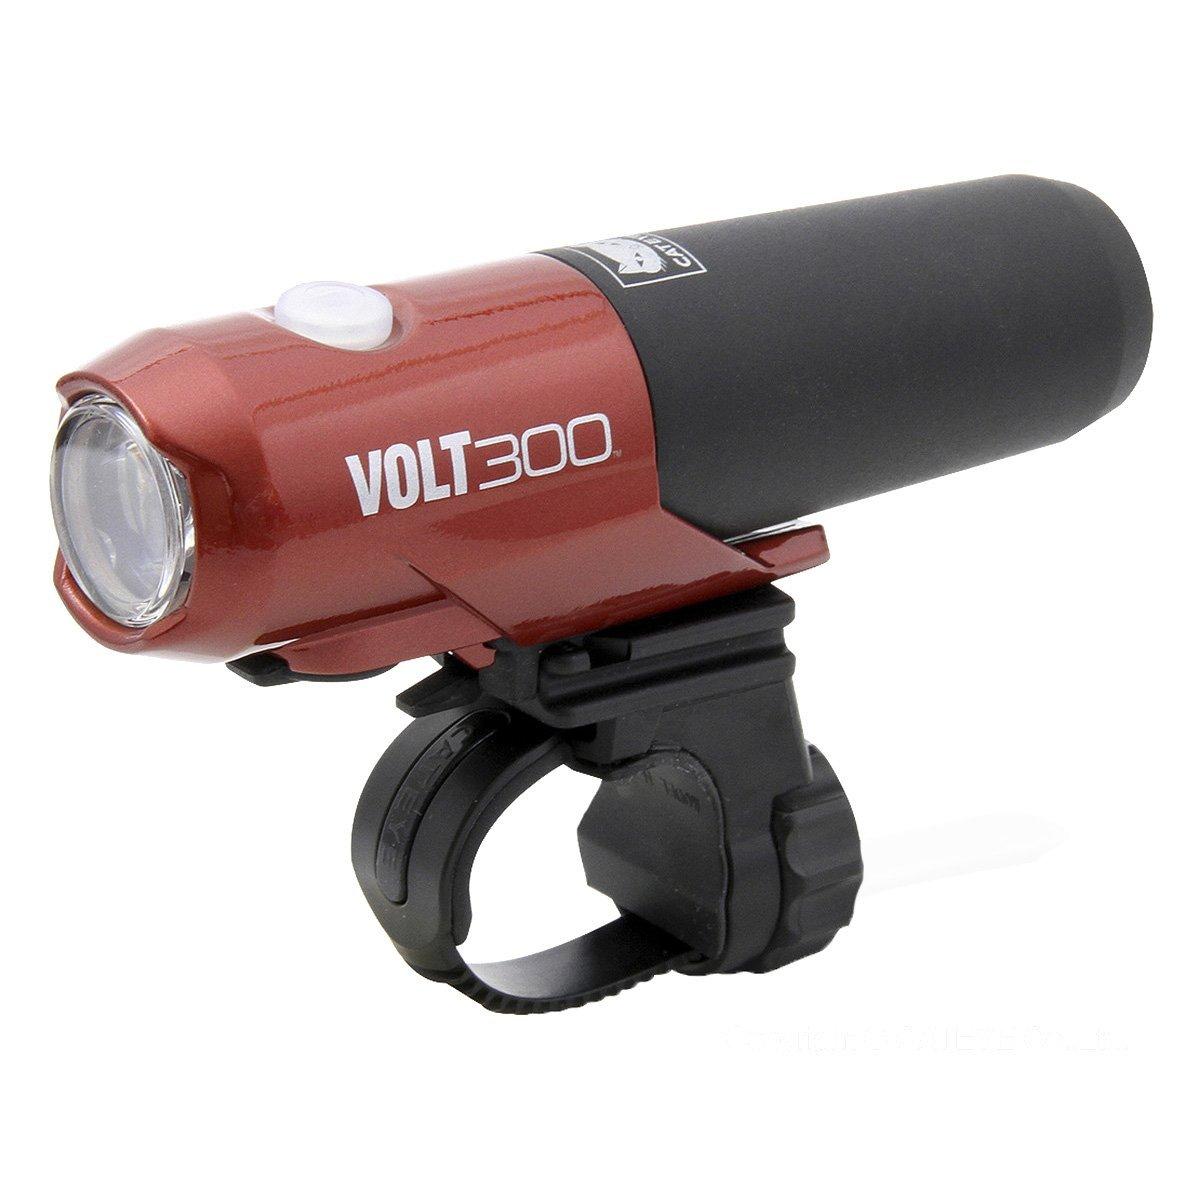 Ltd CatEye 300V Headlight Red Cateye CO 5342773